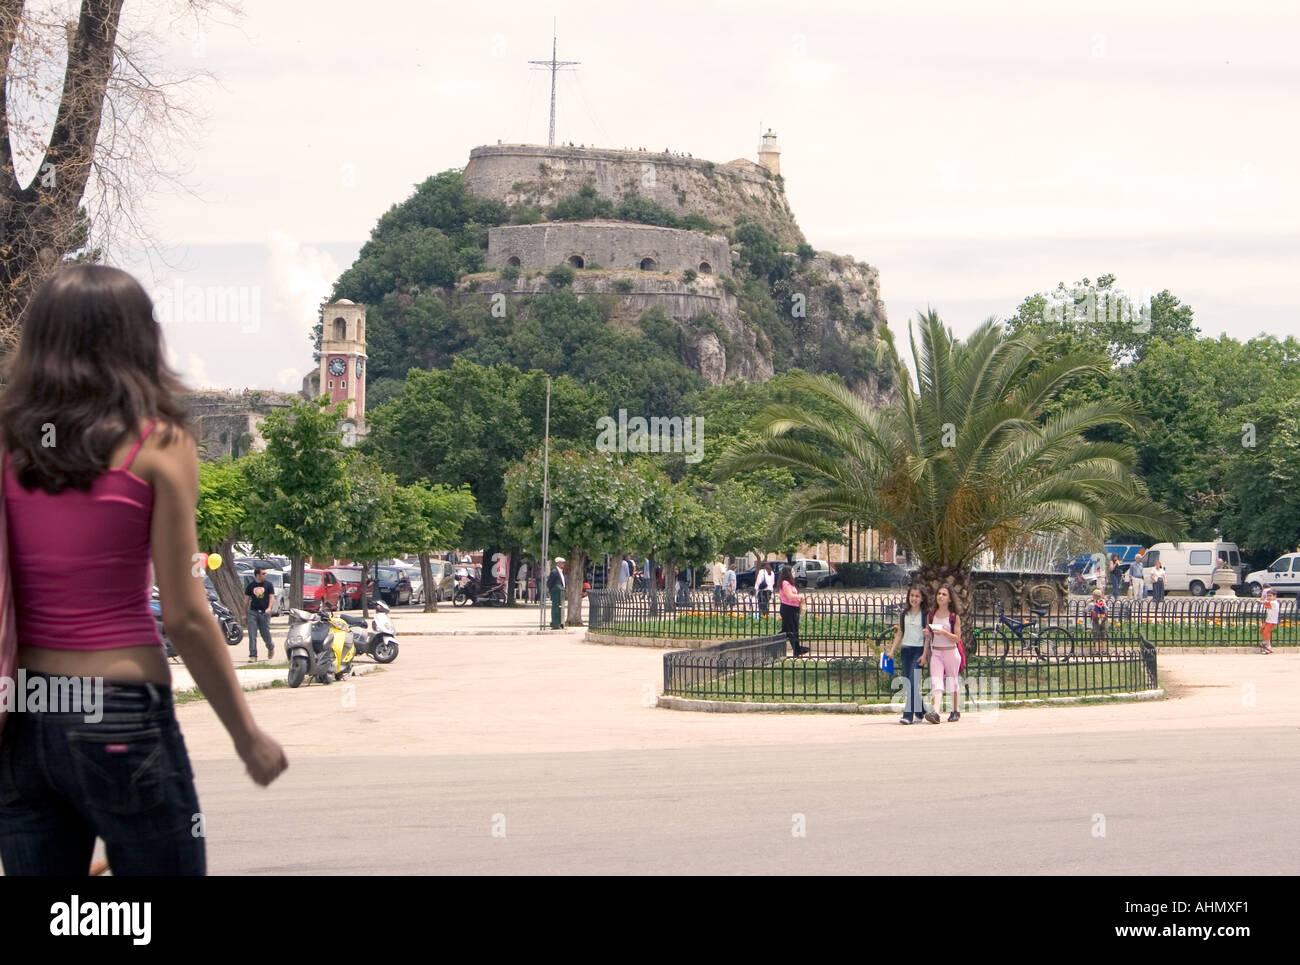 Spianada and Old Fortress, Kerkyra, Corfu, Greece, Europe, person people man woman child costume walk walking stroll - Stock Image